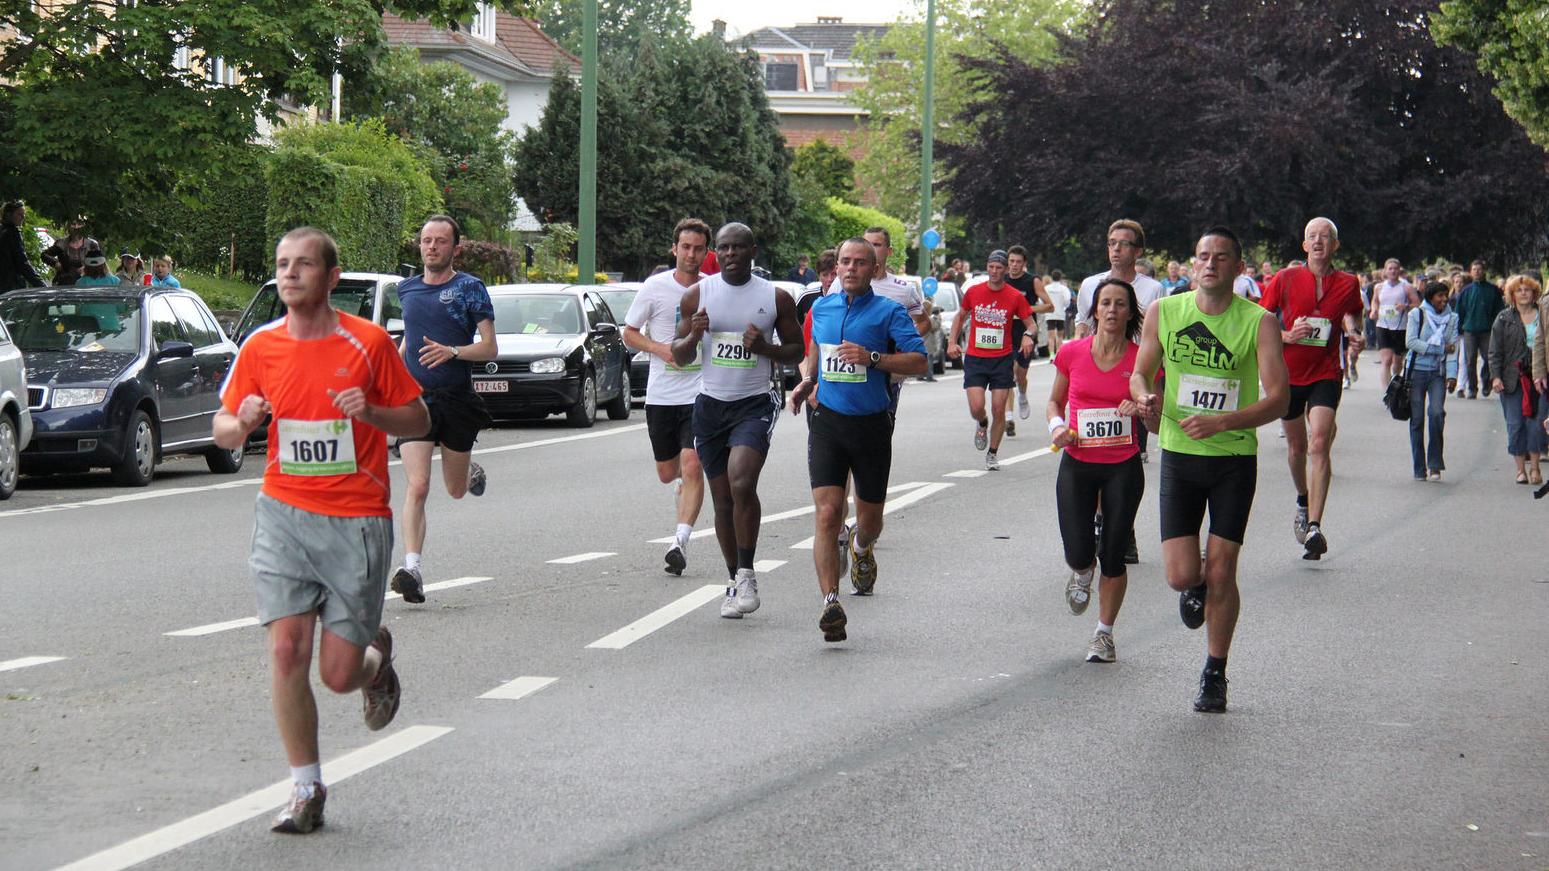 Use Walking Breaks To 'Run' Your First 5km Race